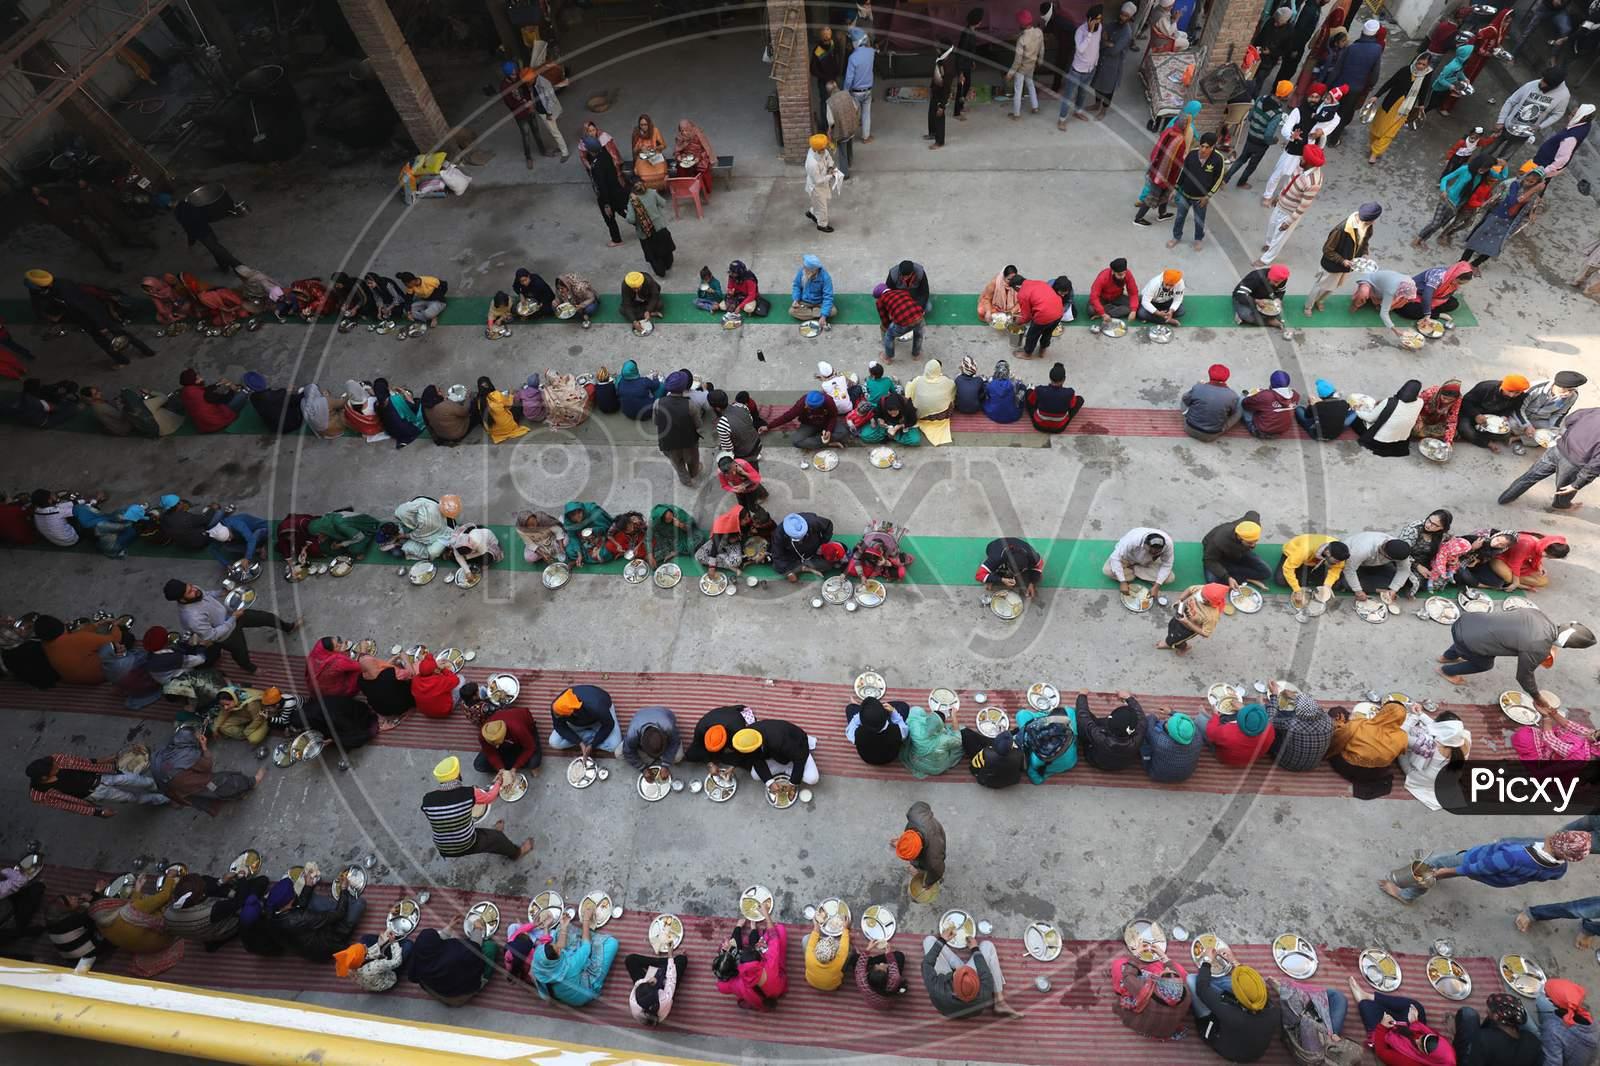 Sikh devotees, eat a meal from a community kitchen during celebrations to mark the birth anniversary of the first Sikh Guru, Guru Nanak Dev, at a Gurudwara, or Sikh temple, in Jammu,30 November,2020.